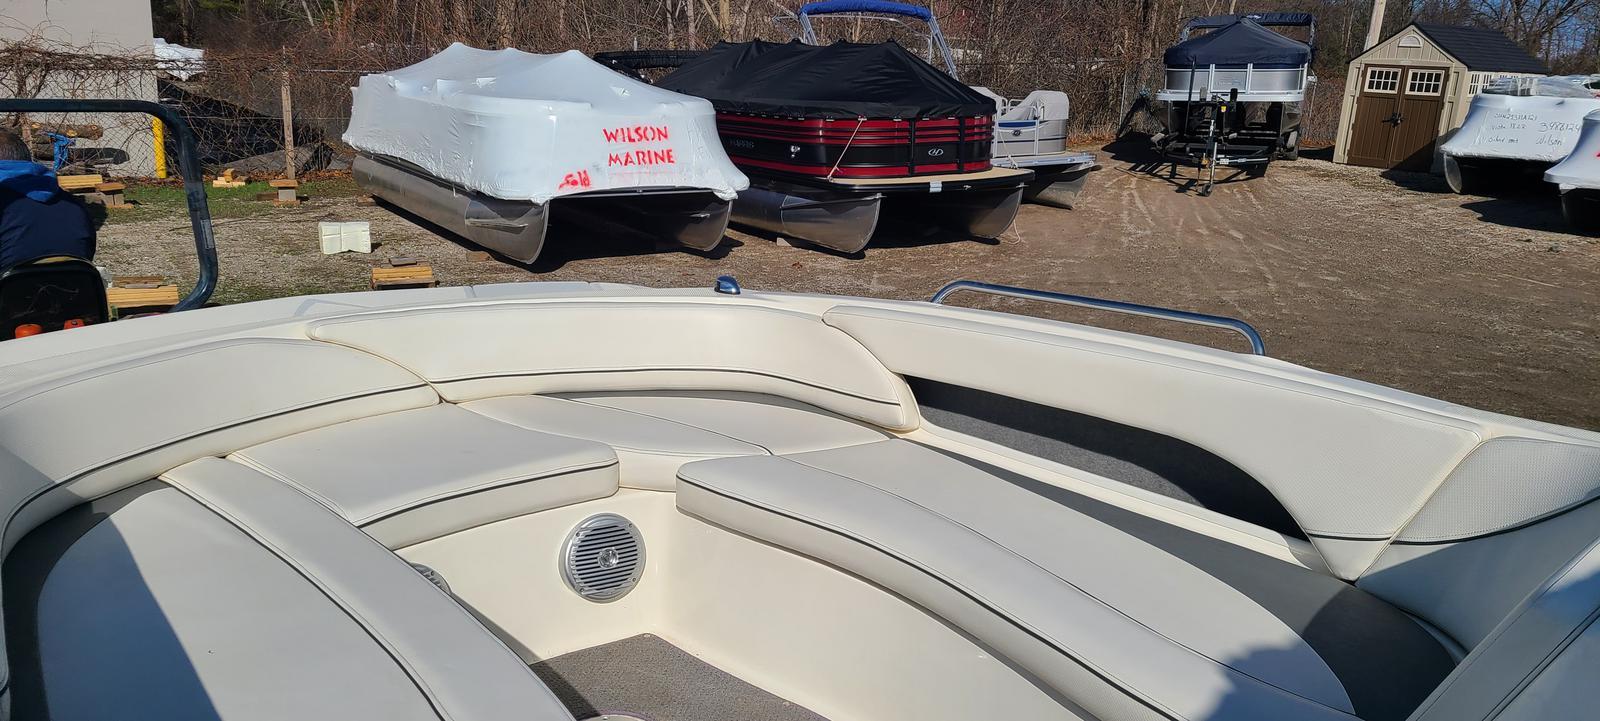 2009 Bayliner boat for sale, model of the boat is 197 & Image # 2 of 6